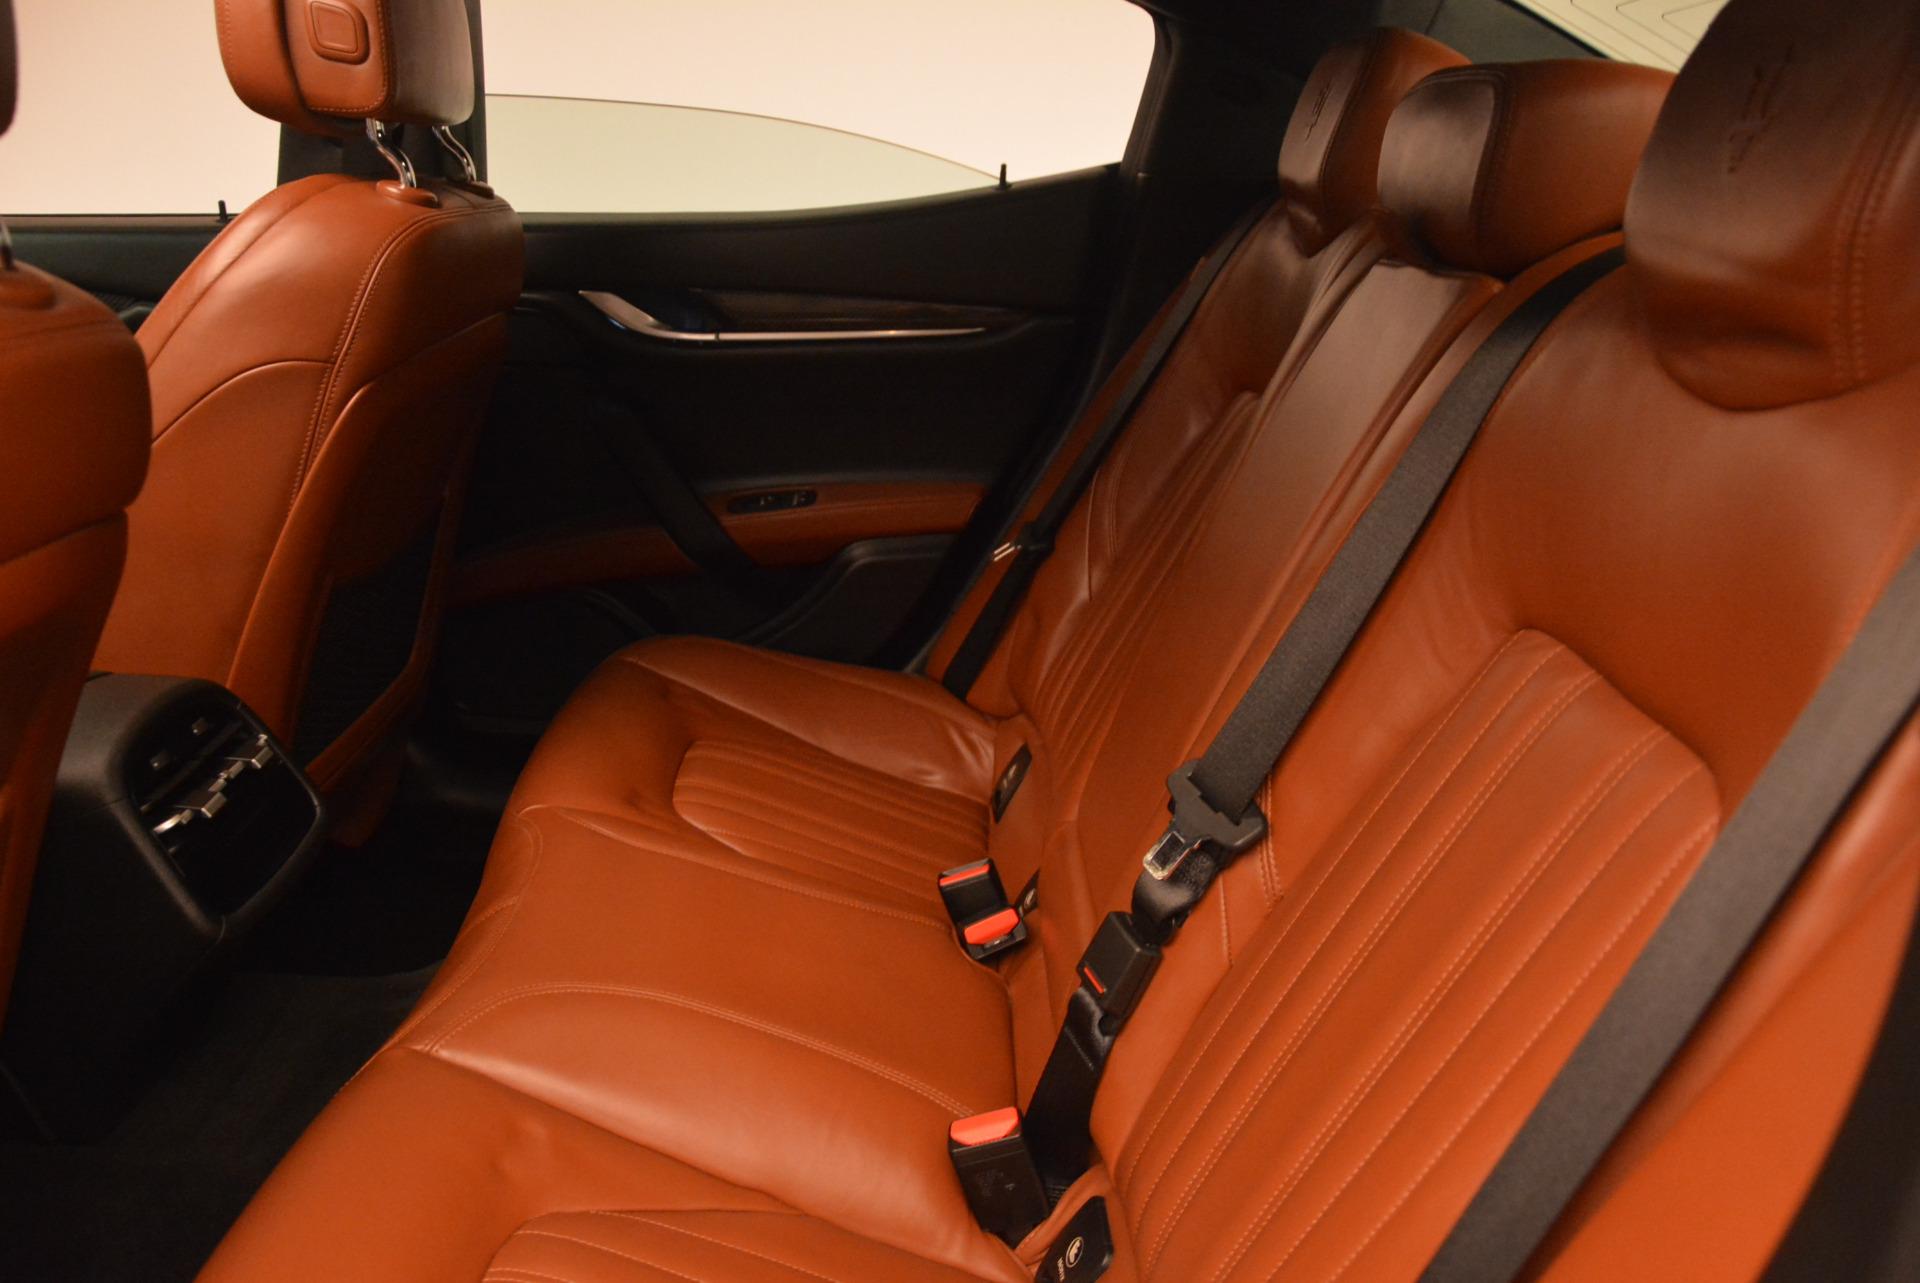 Used 2014 Maserati Ghibli S Q4 For Sale In Greenwich, CT. Alfa Romeo of Greenwich, 7132 805_p18